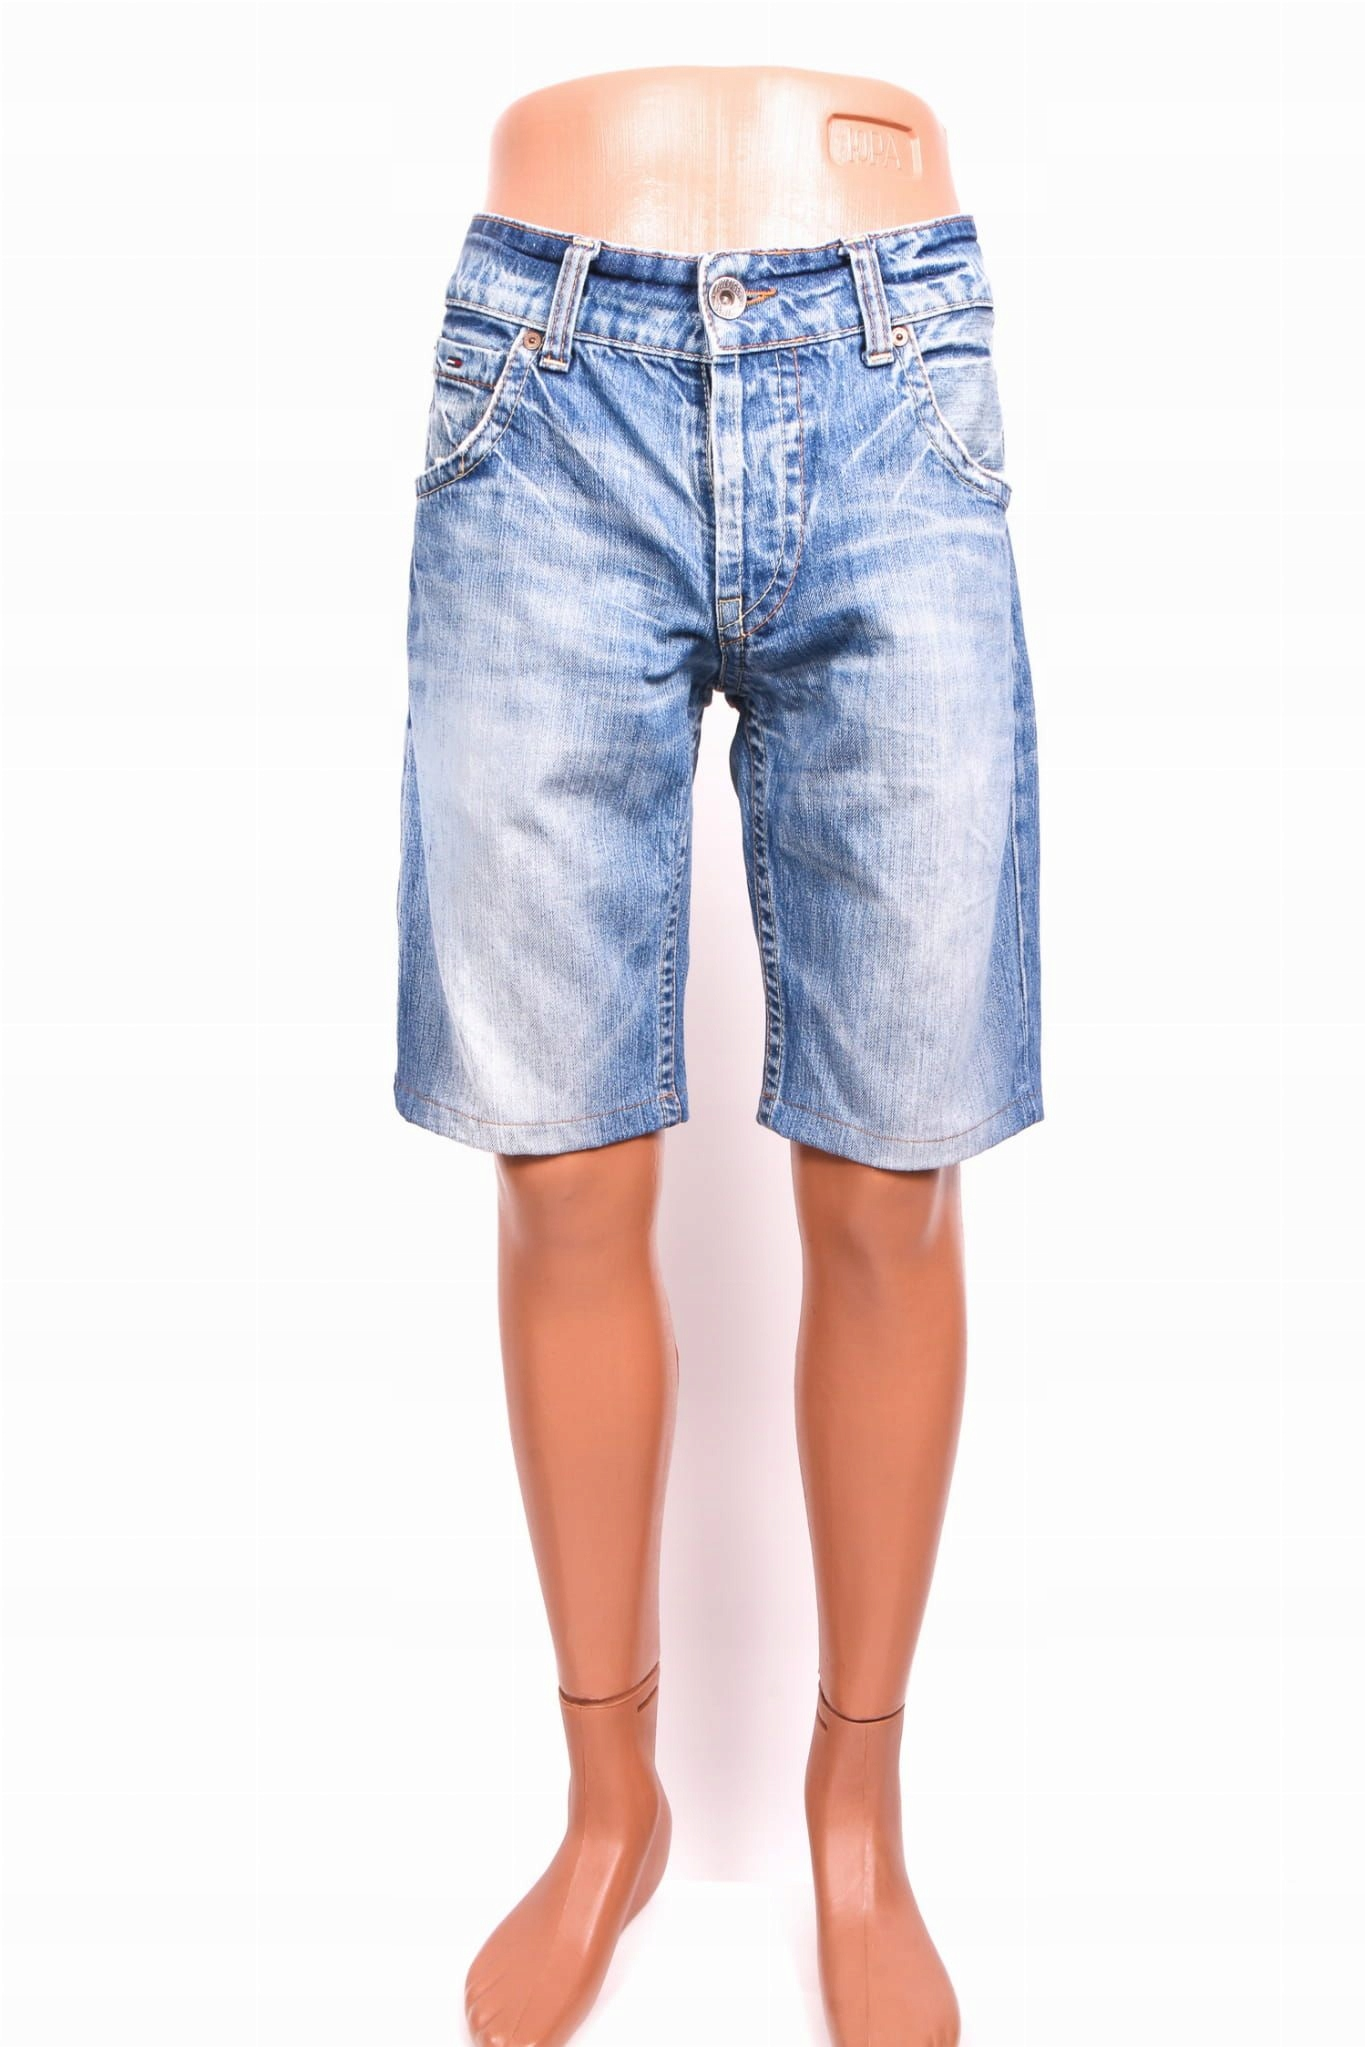 Tommy Hilfiger Spodenki Dżinsowe Męskie Jeans r L